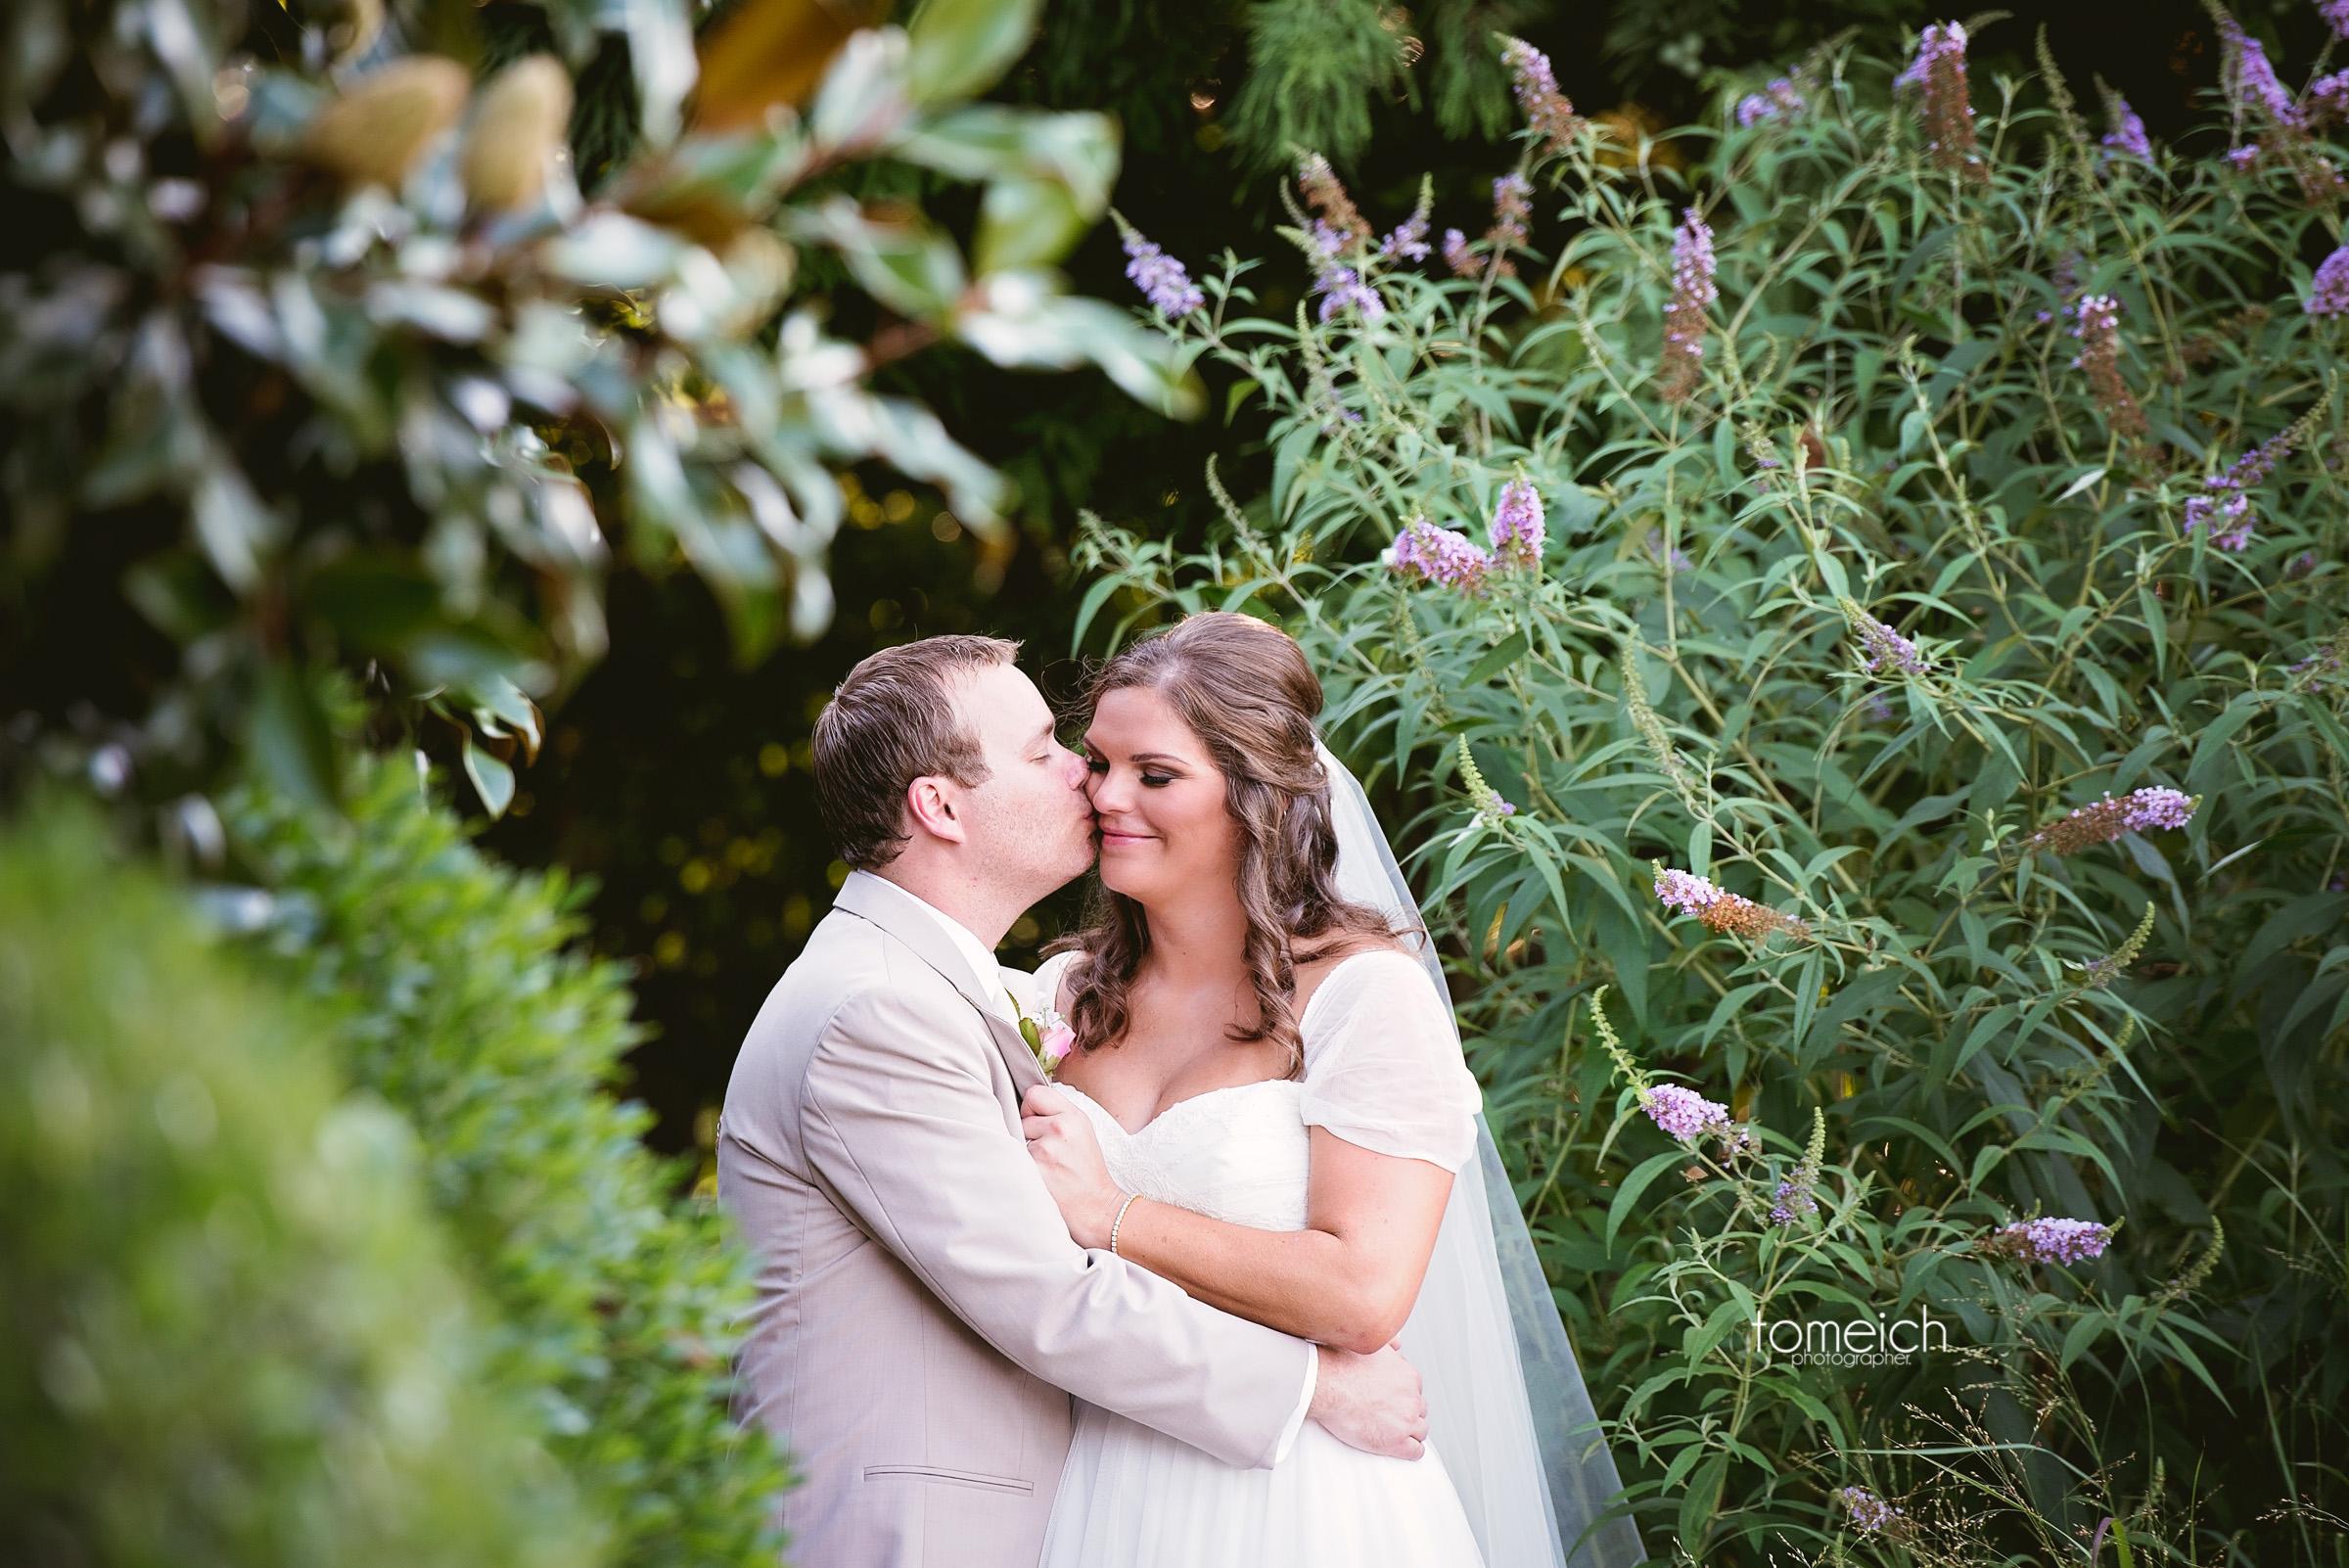 butterfly house wedding chesterfield-27.jpg